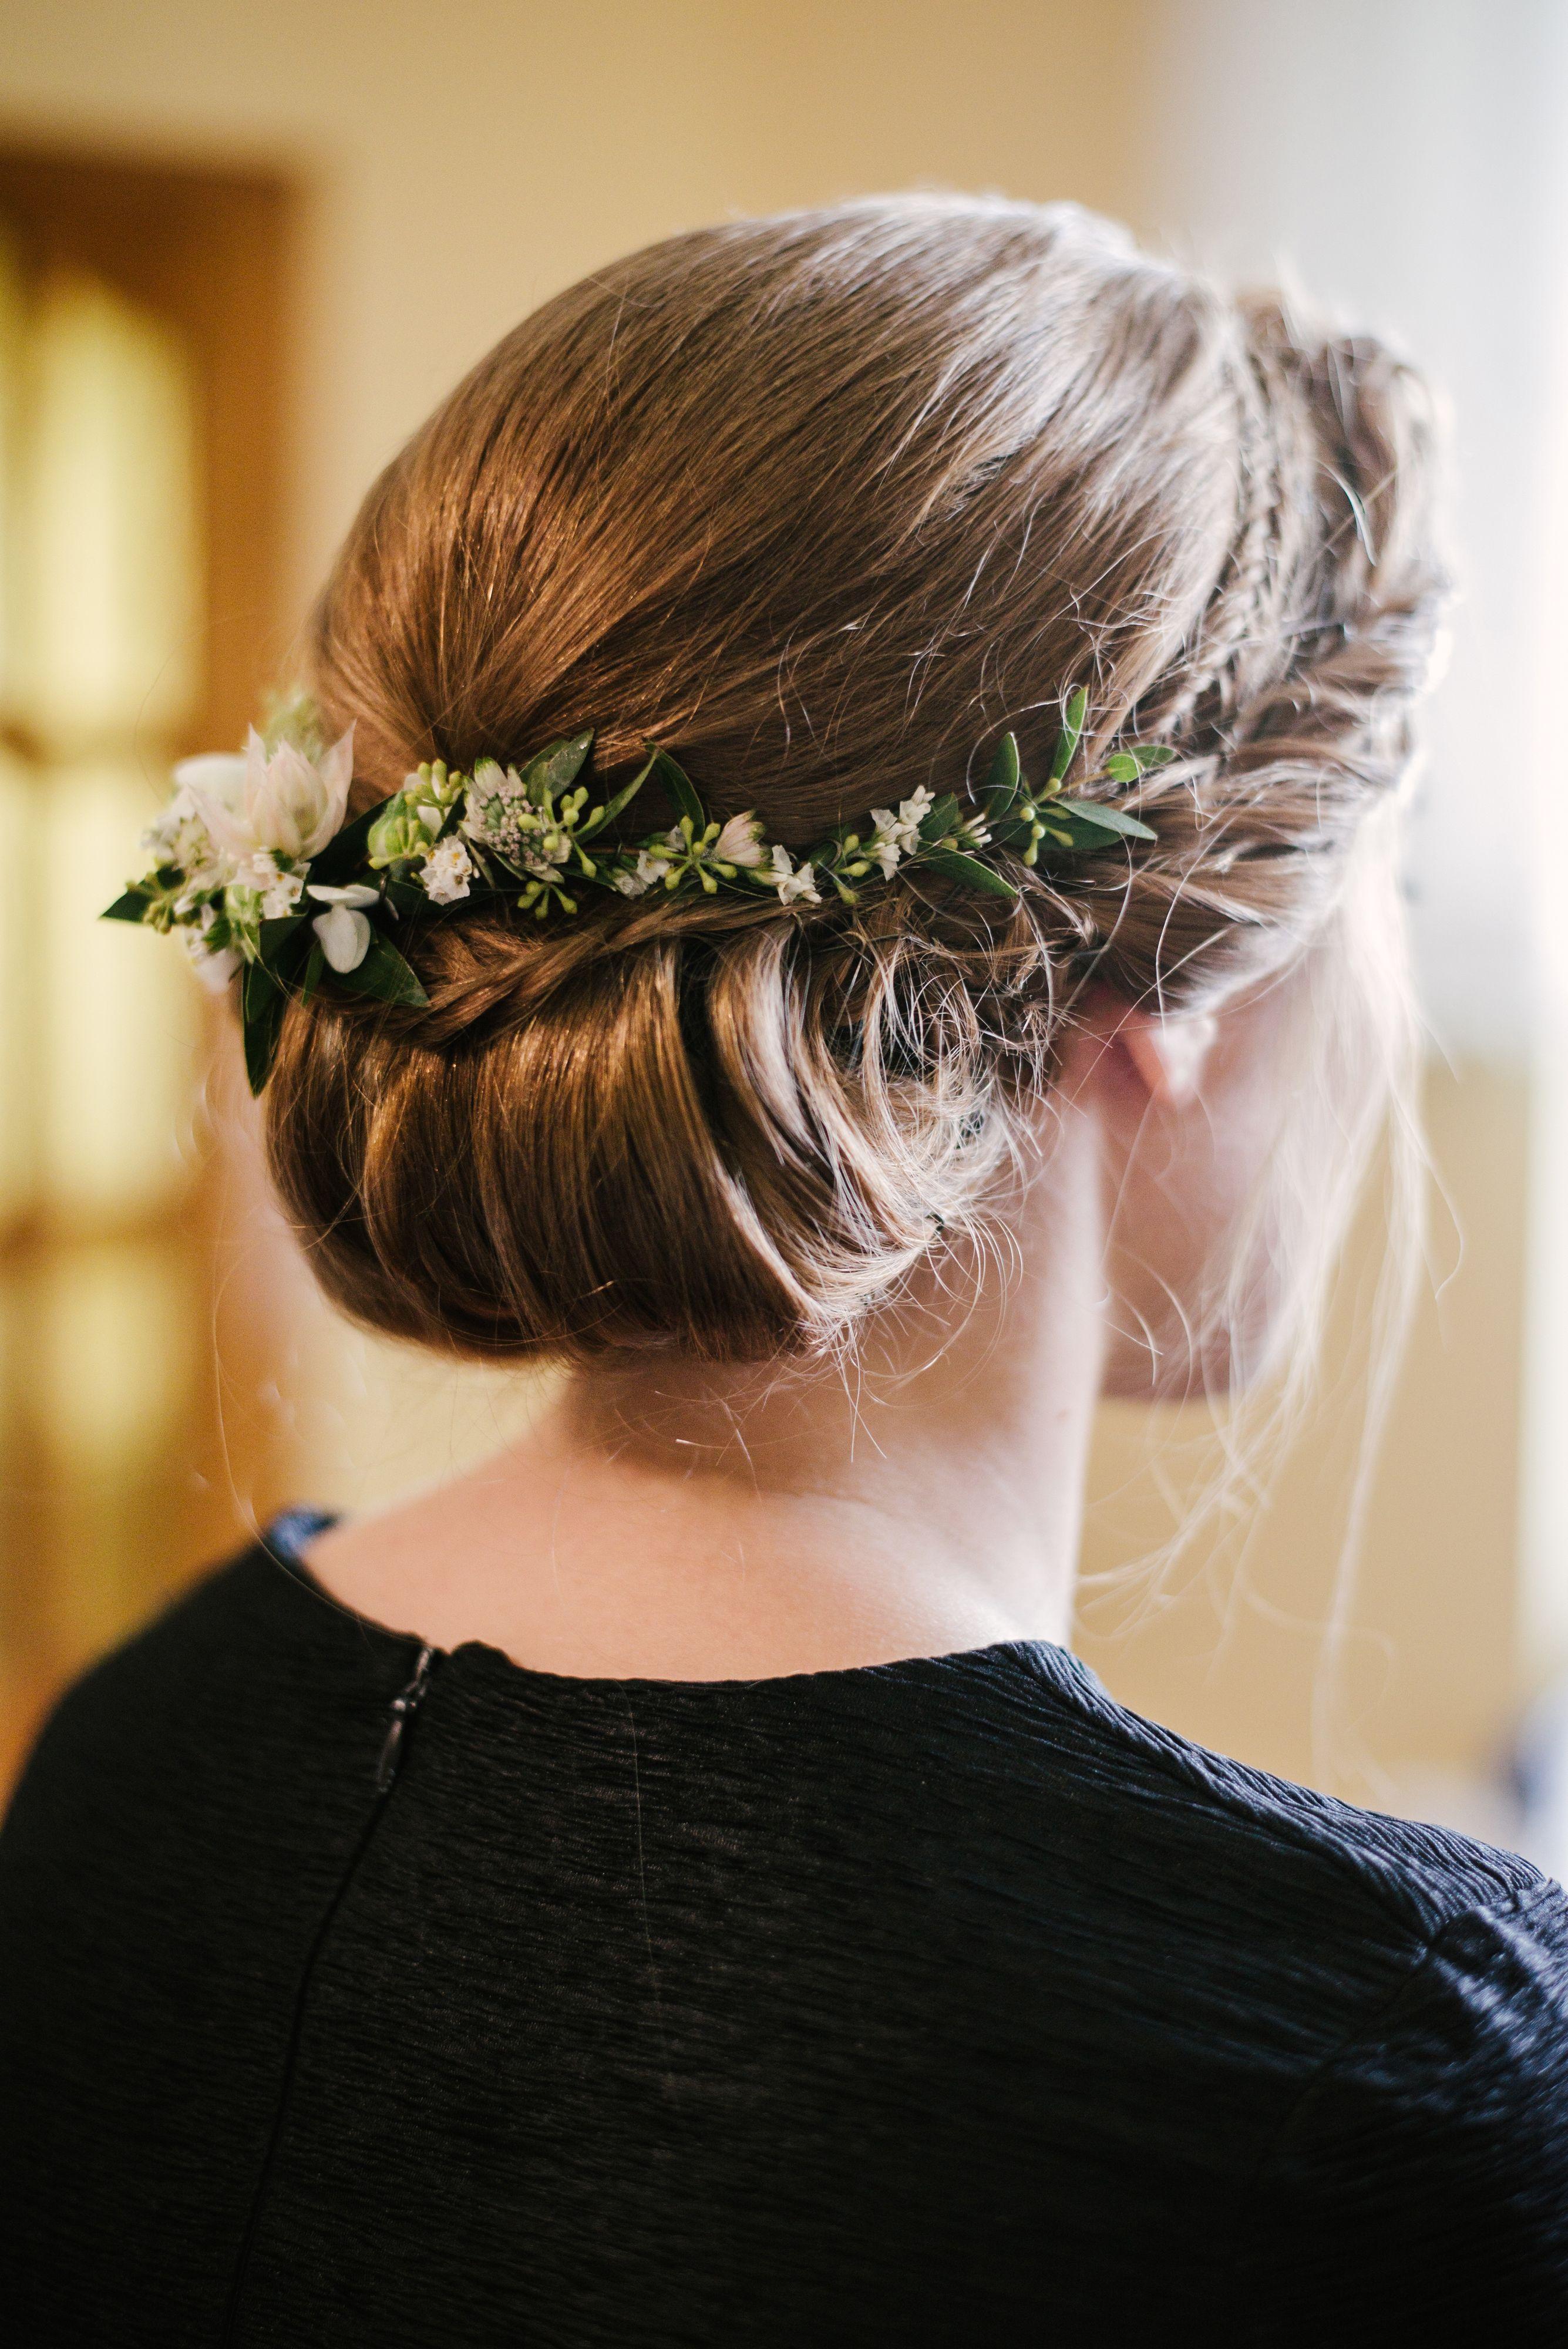 Inna Studio Greenery Pol Wianek Naturalna Panna Mloda Fot Tiamofoto Bridal Hair Hairstyle Bridal